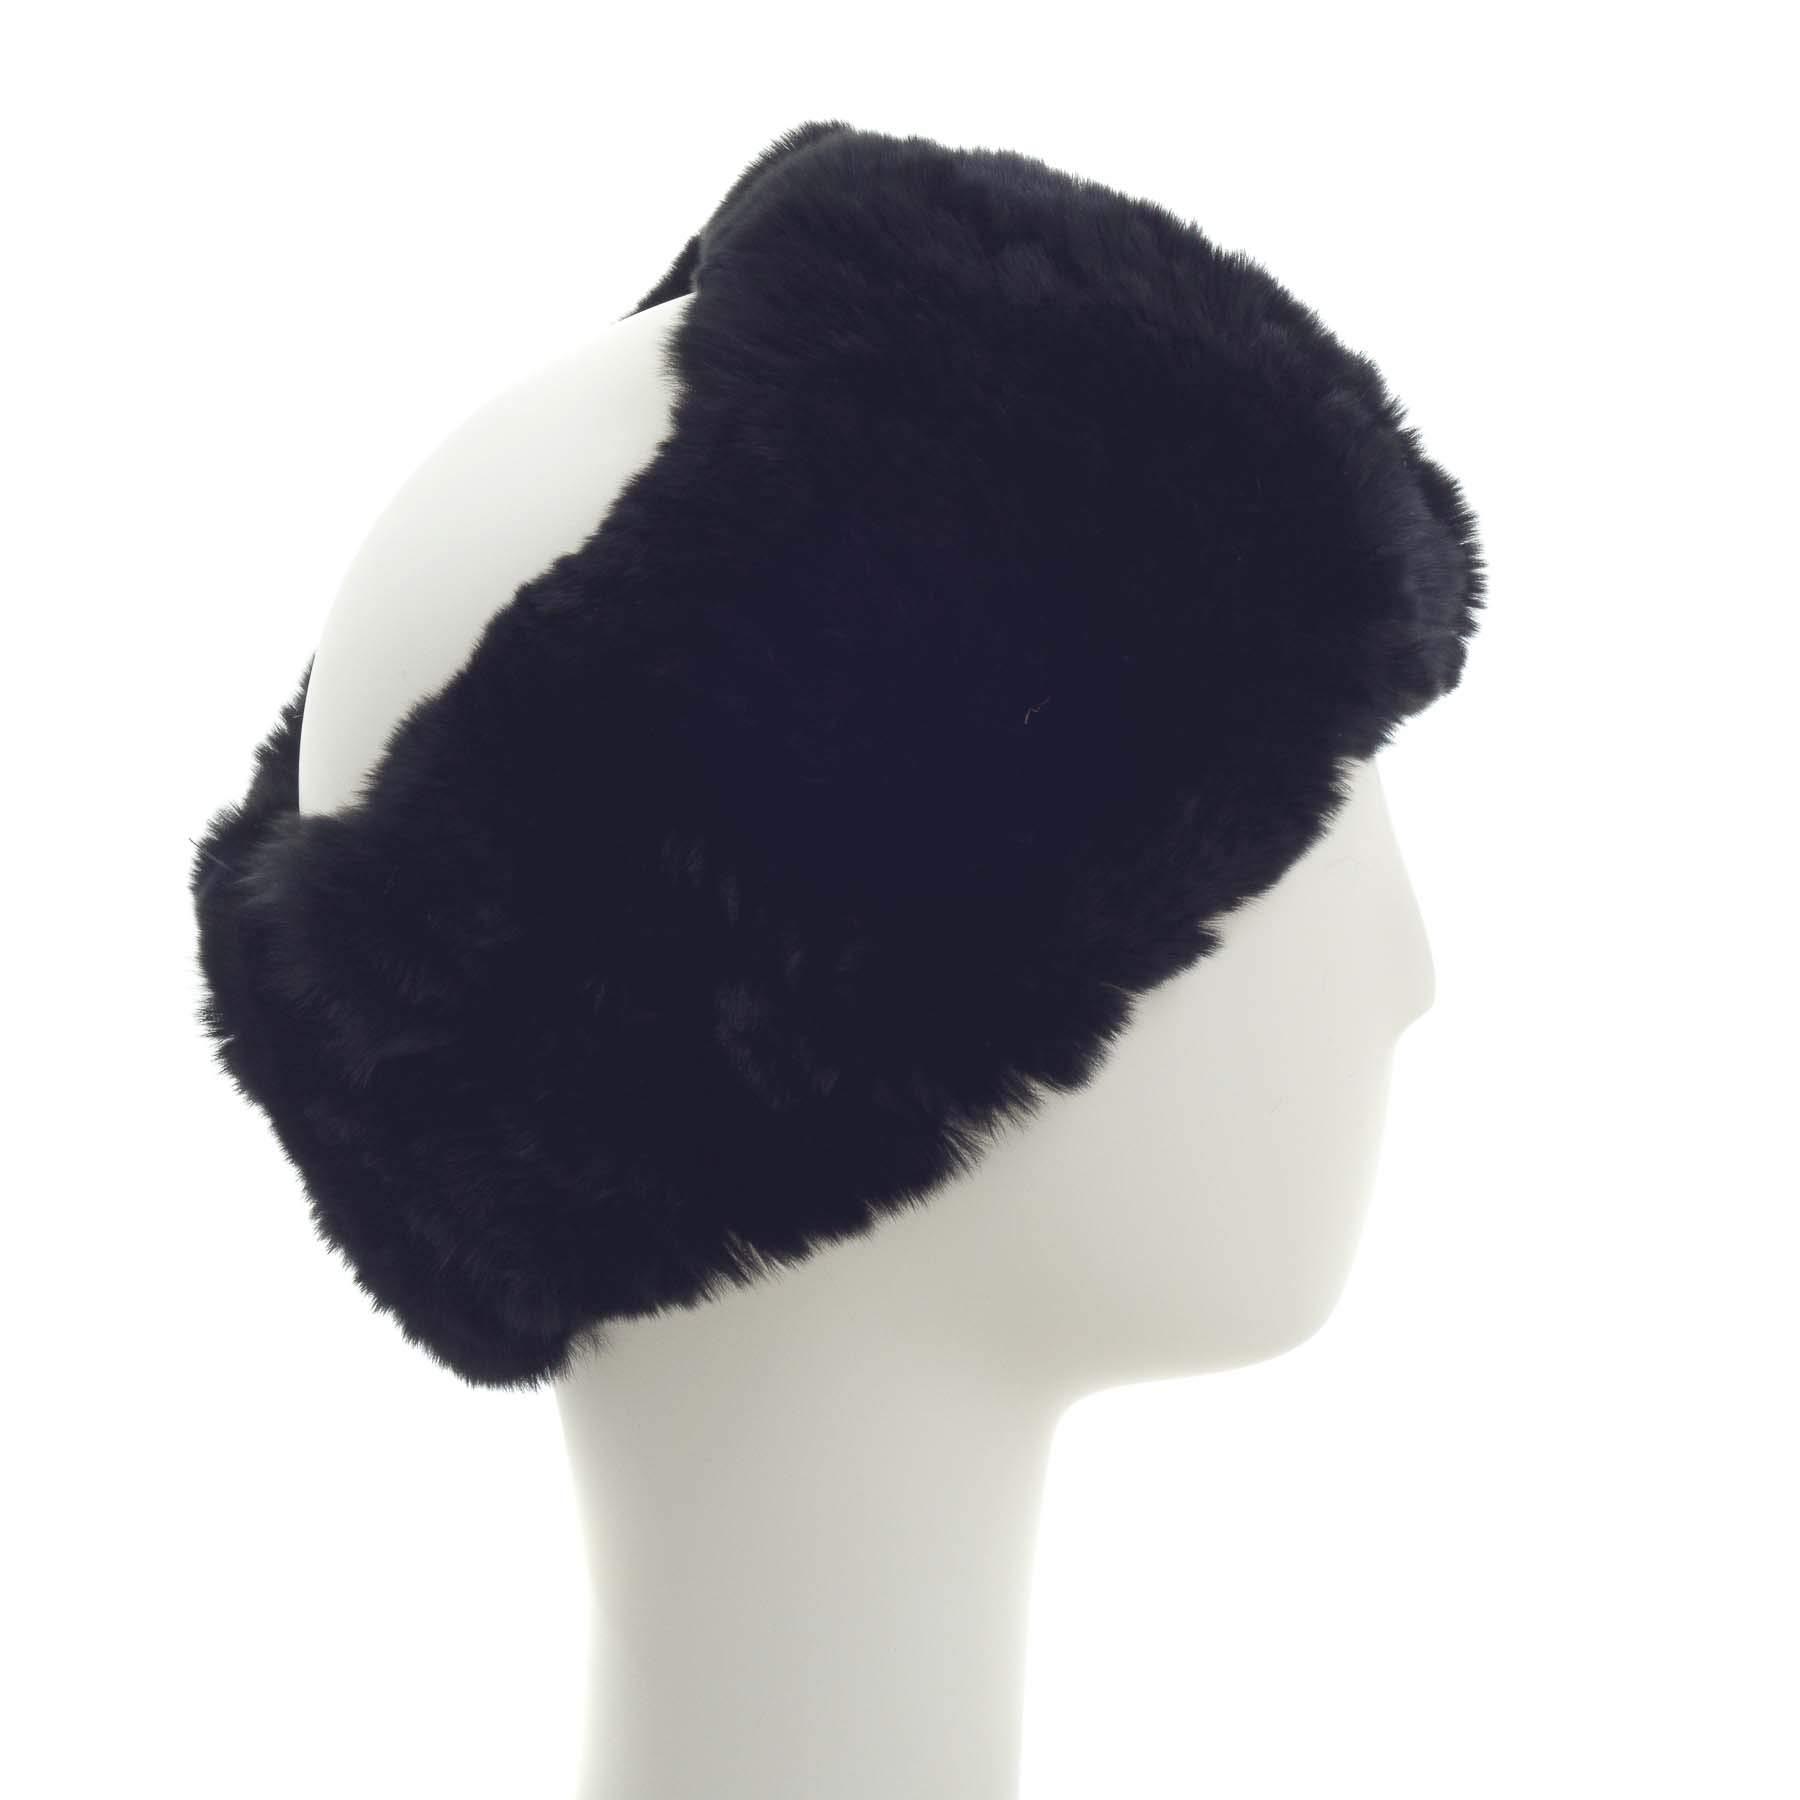 Surell Rex Rabbit Textile Knit Headband - Winter Scarf Ear Warmers - Luxury Gift (Black)